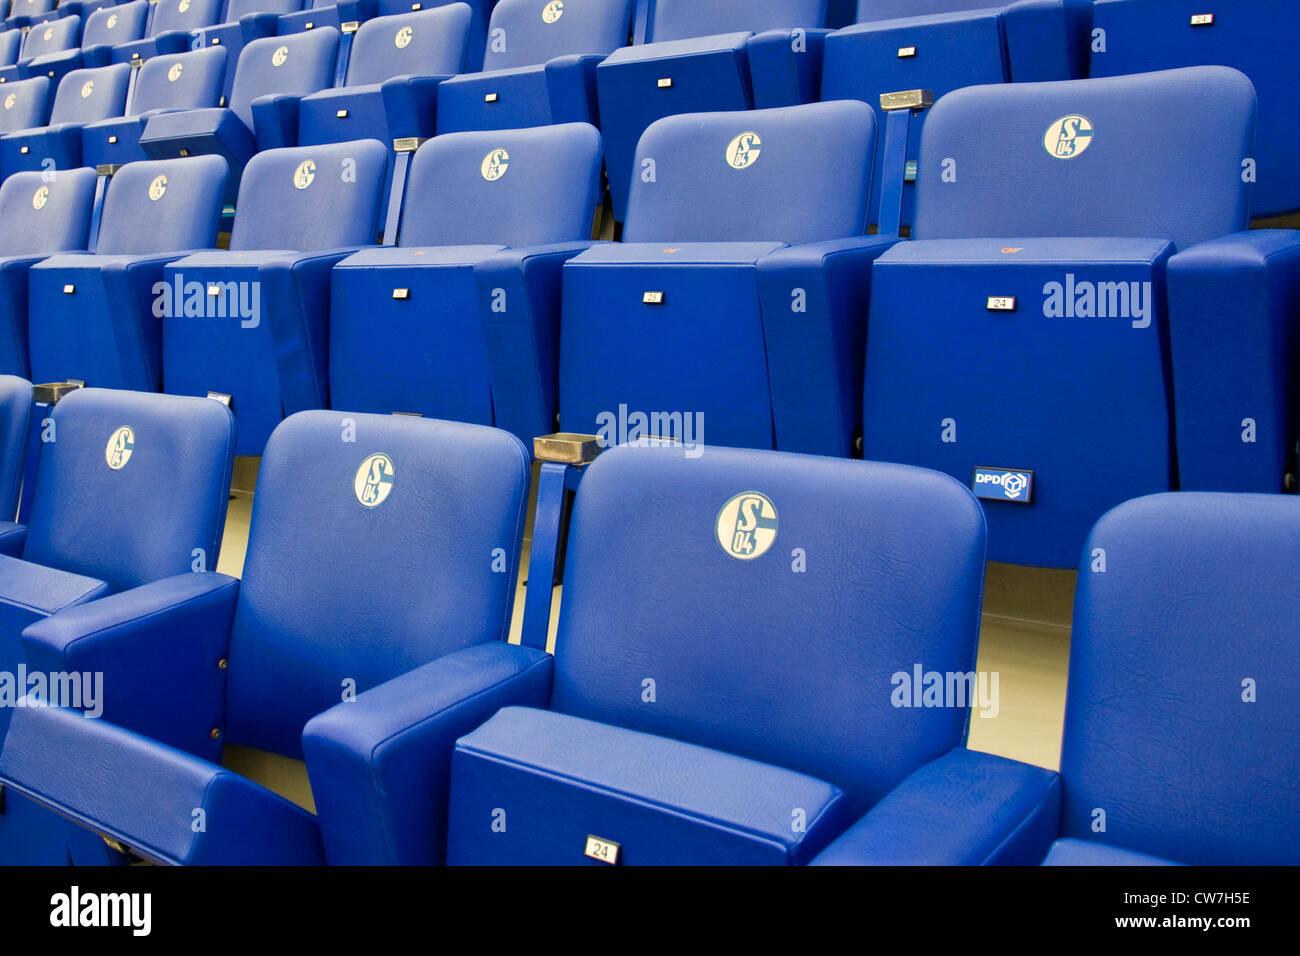 Veltins-Areana; VIP seats, Germany, Ruhr Area, Gelsenkirchen - Stock Image